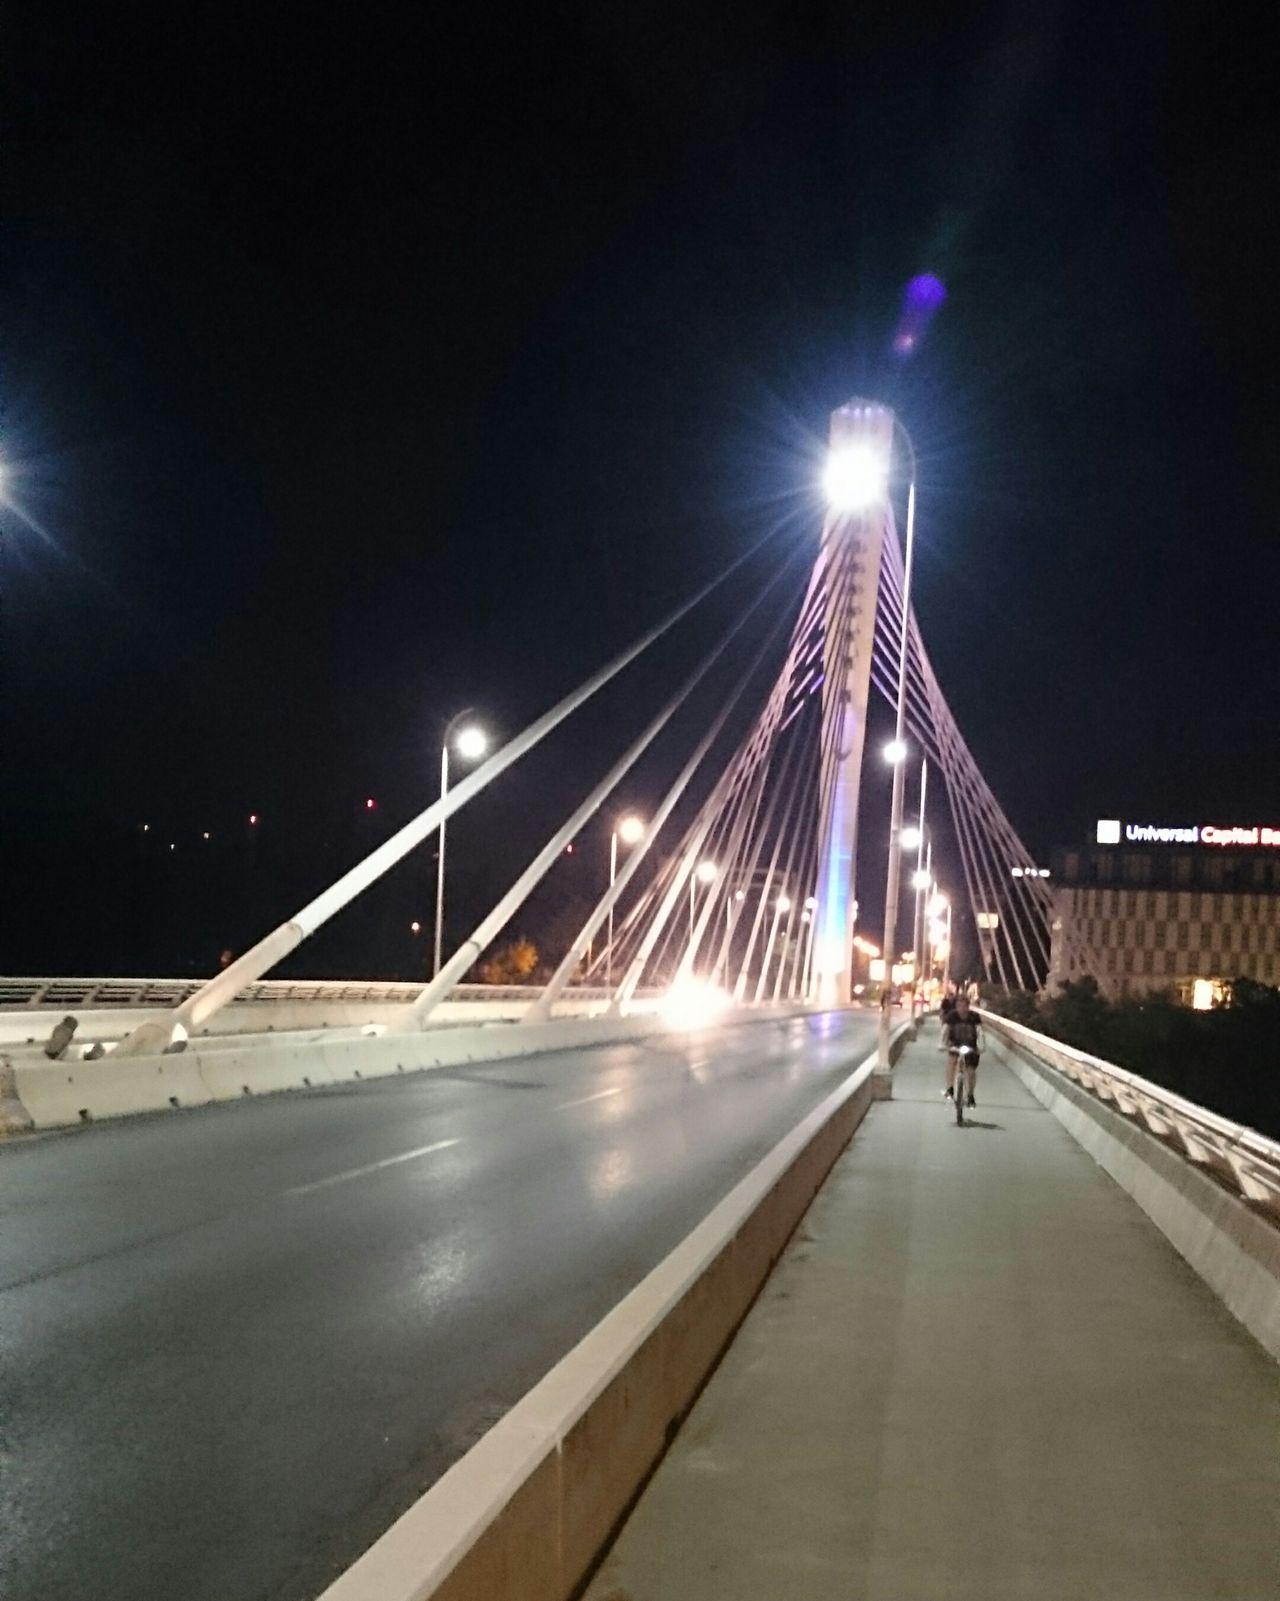 Nofilter Nofilternoedit Nightphotography Bridge Moonlight Montenegro Podgorica Podgorica, Montenegro Balkans Calmness Millenium Bridge Nightwalk Cityscapes Citylife Capital Citycenter Lights Enjoying Life Modern